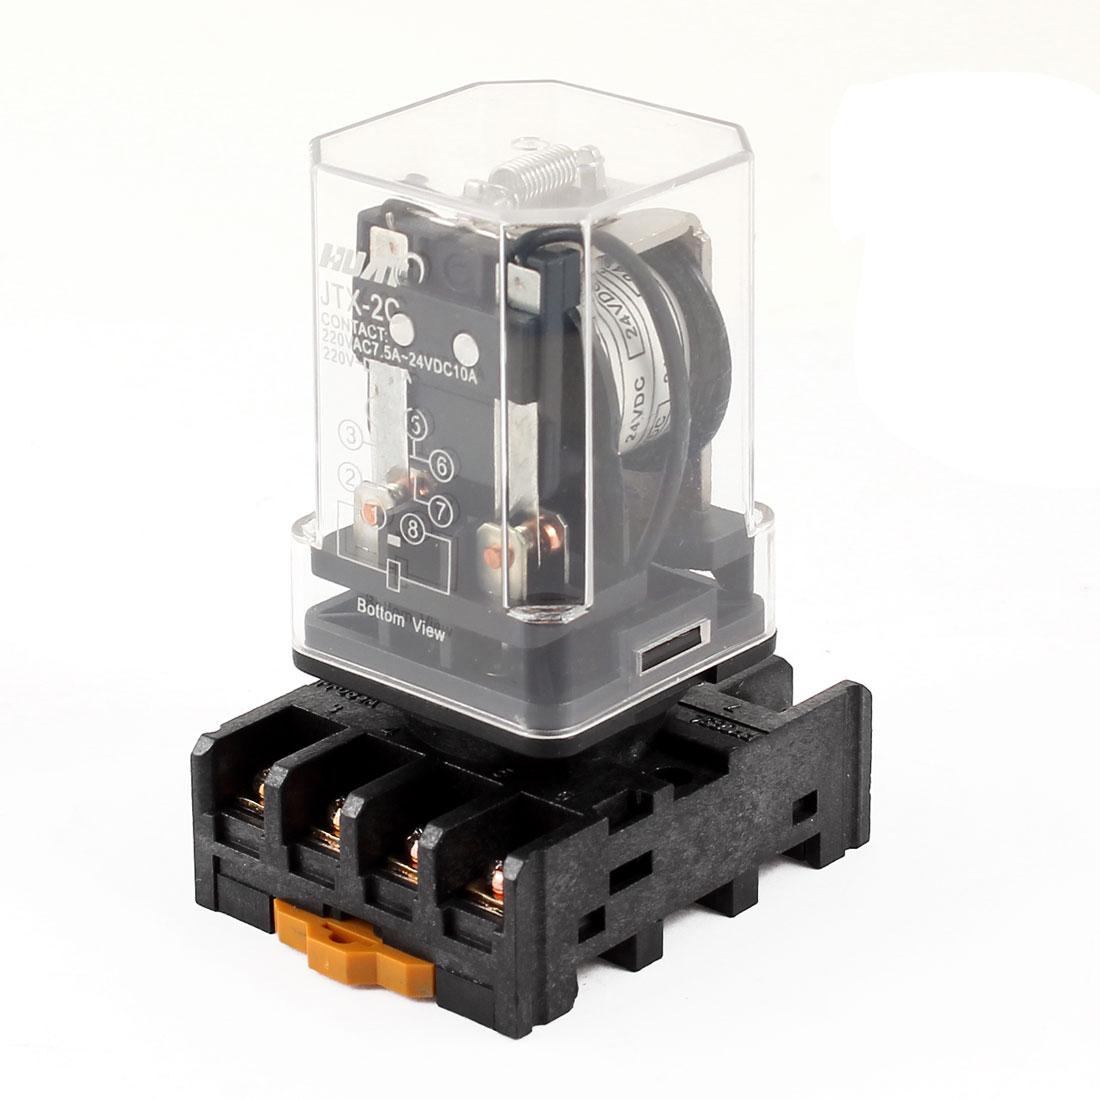 цена на Jtx-2C Clear Plastic Shell 24V Coil Dpdt 8 Pins Electromagnetic Relay 35Mm Din Rail Socket Base Power Supplies Relays